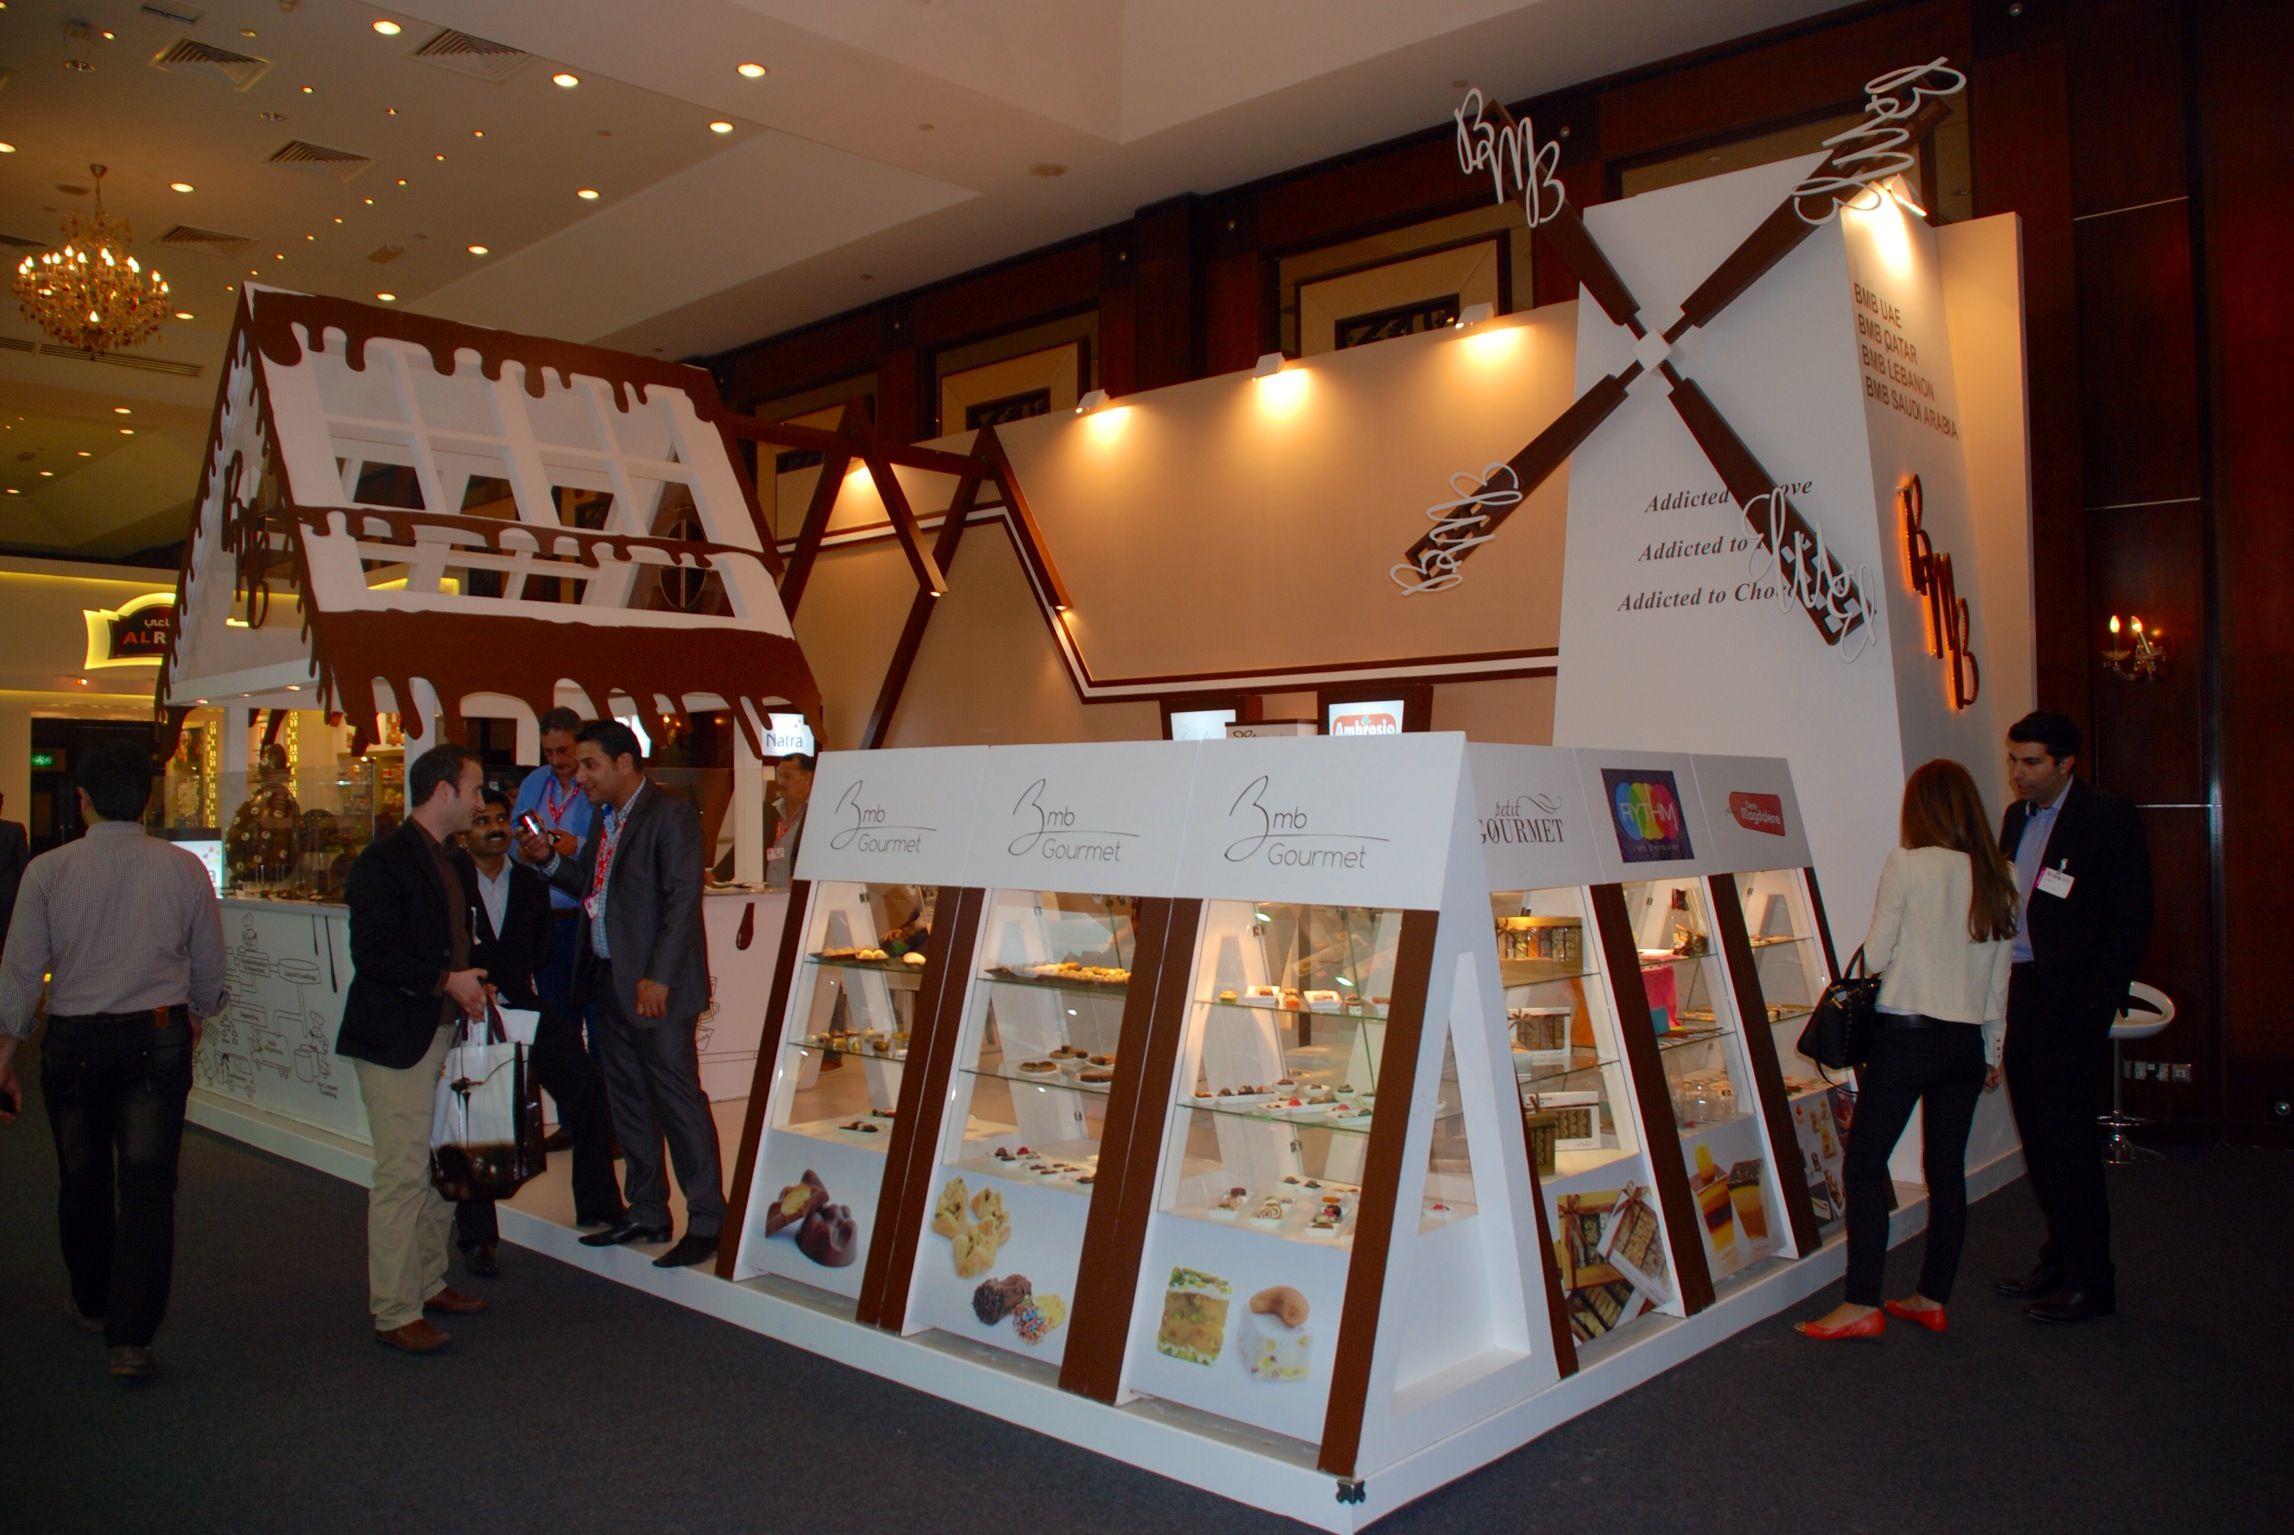 Exhibition Shell Zone : Concept zone exhibition fixture fzco